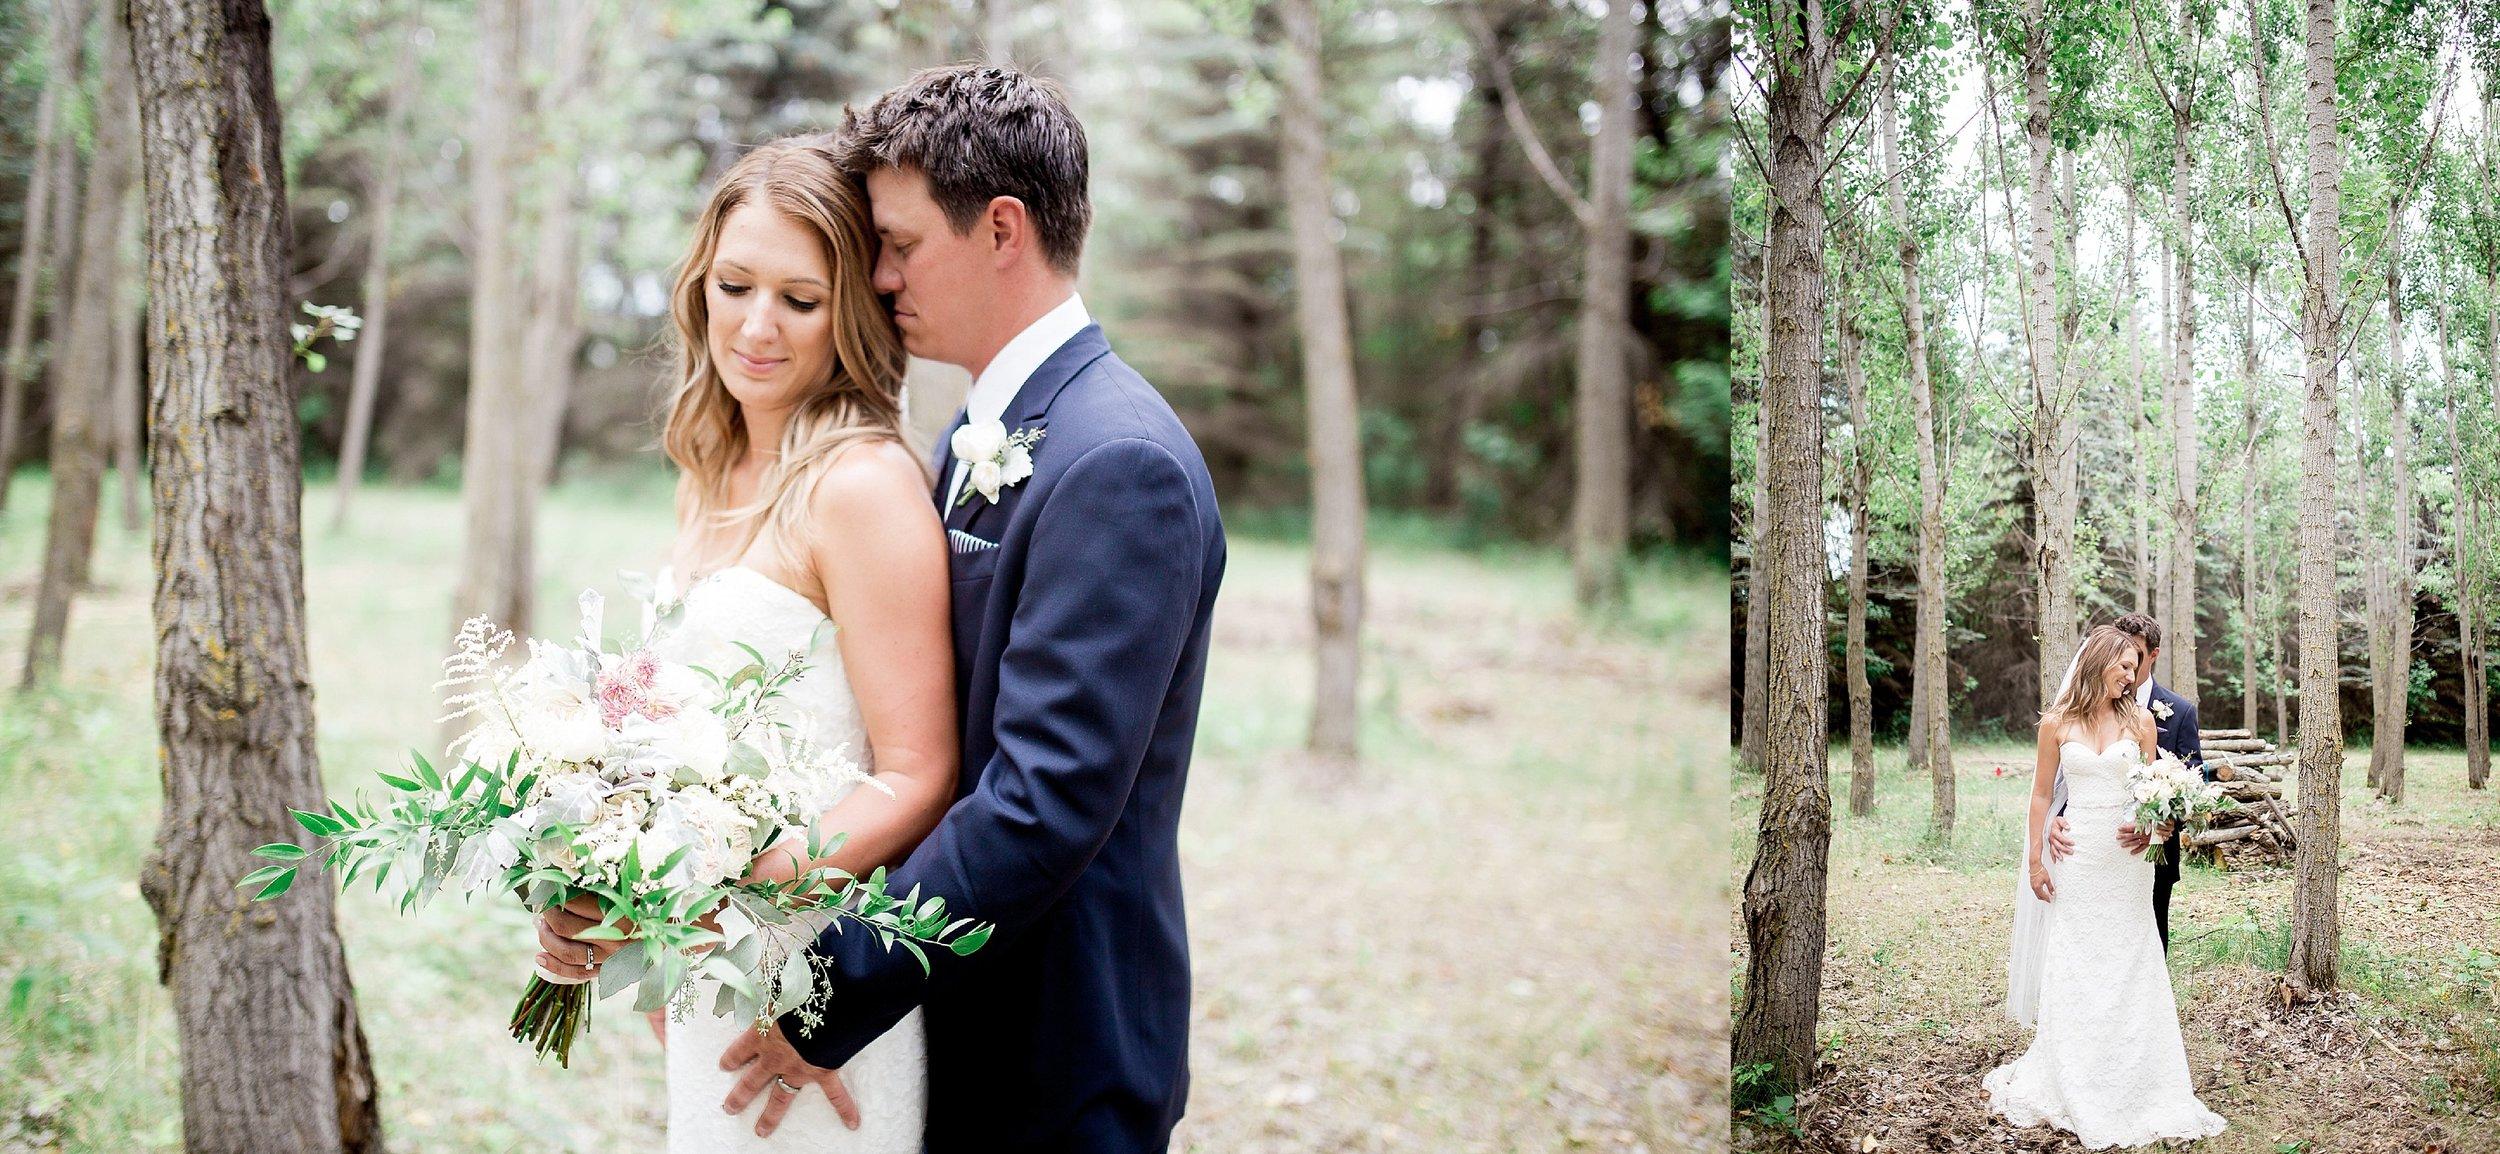 Winnipeg wedding photographer   Keila Marie Photography   Bride and groom portraits in a forest  Garden inspired wedding